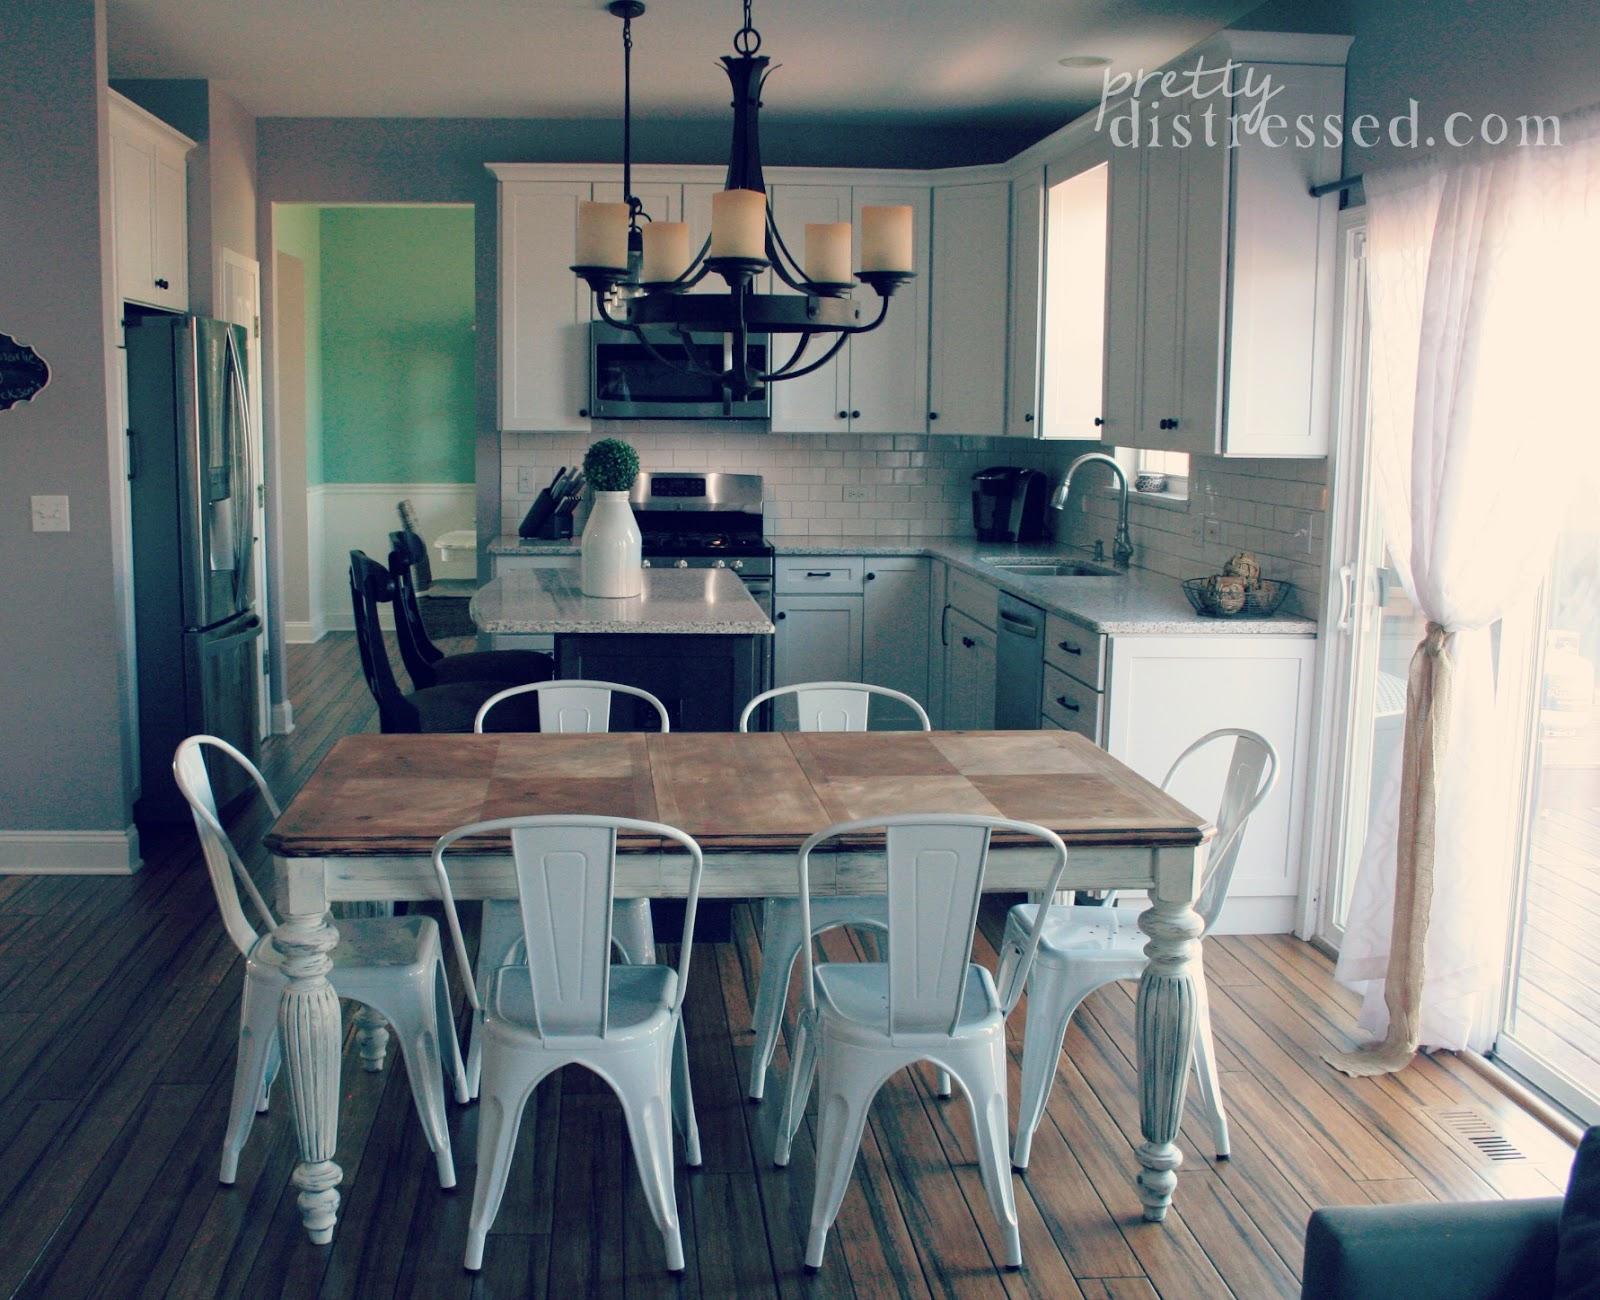 Table painted farmhouse table and chairs - Chalk Paint Farmhouse Table